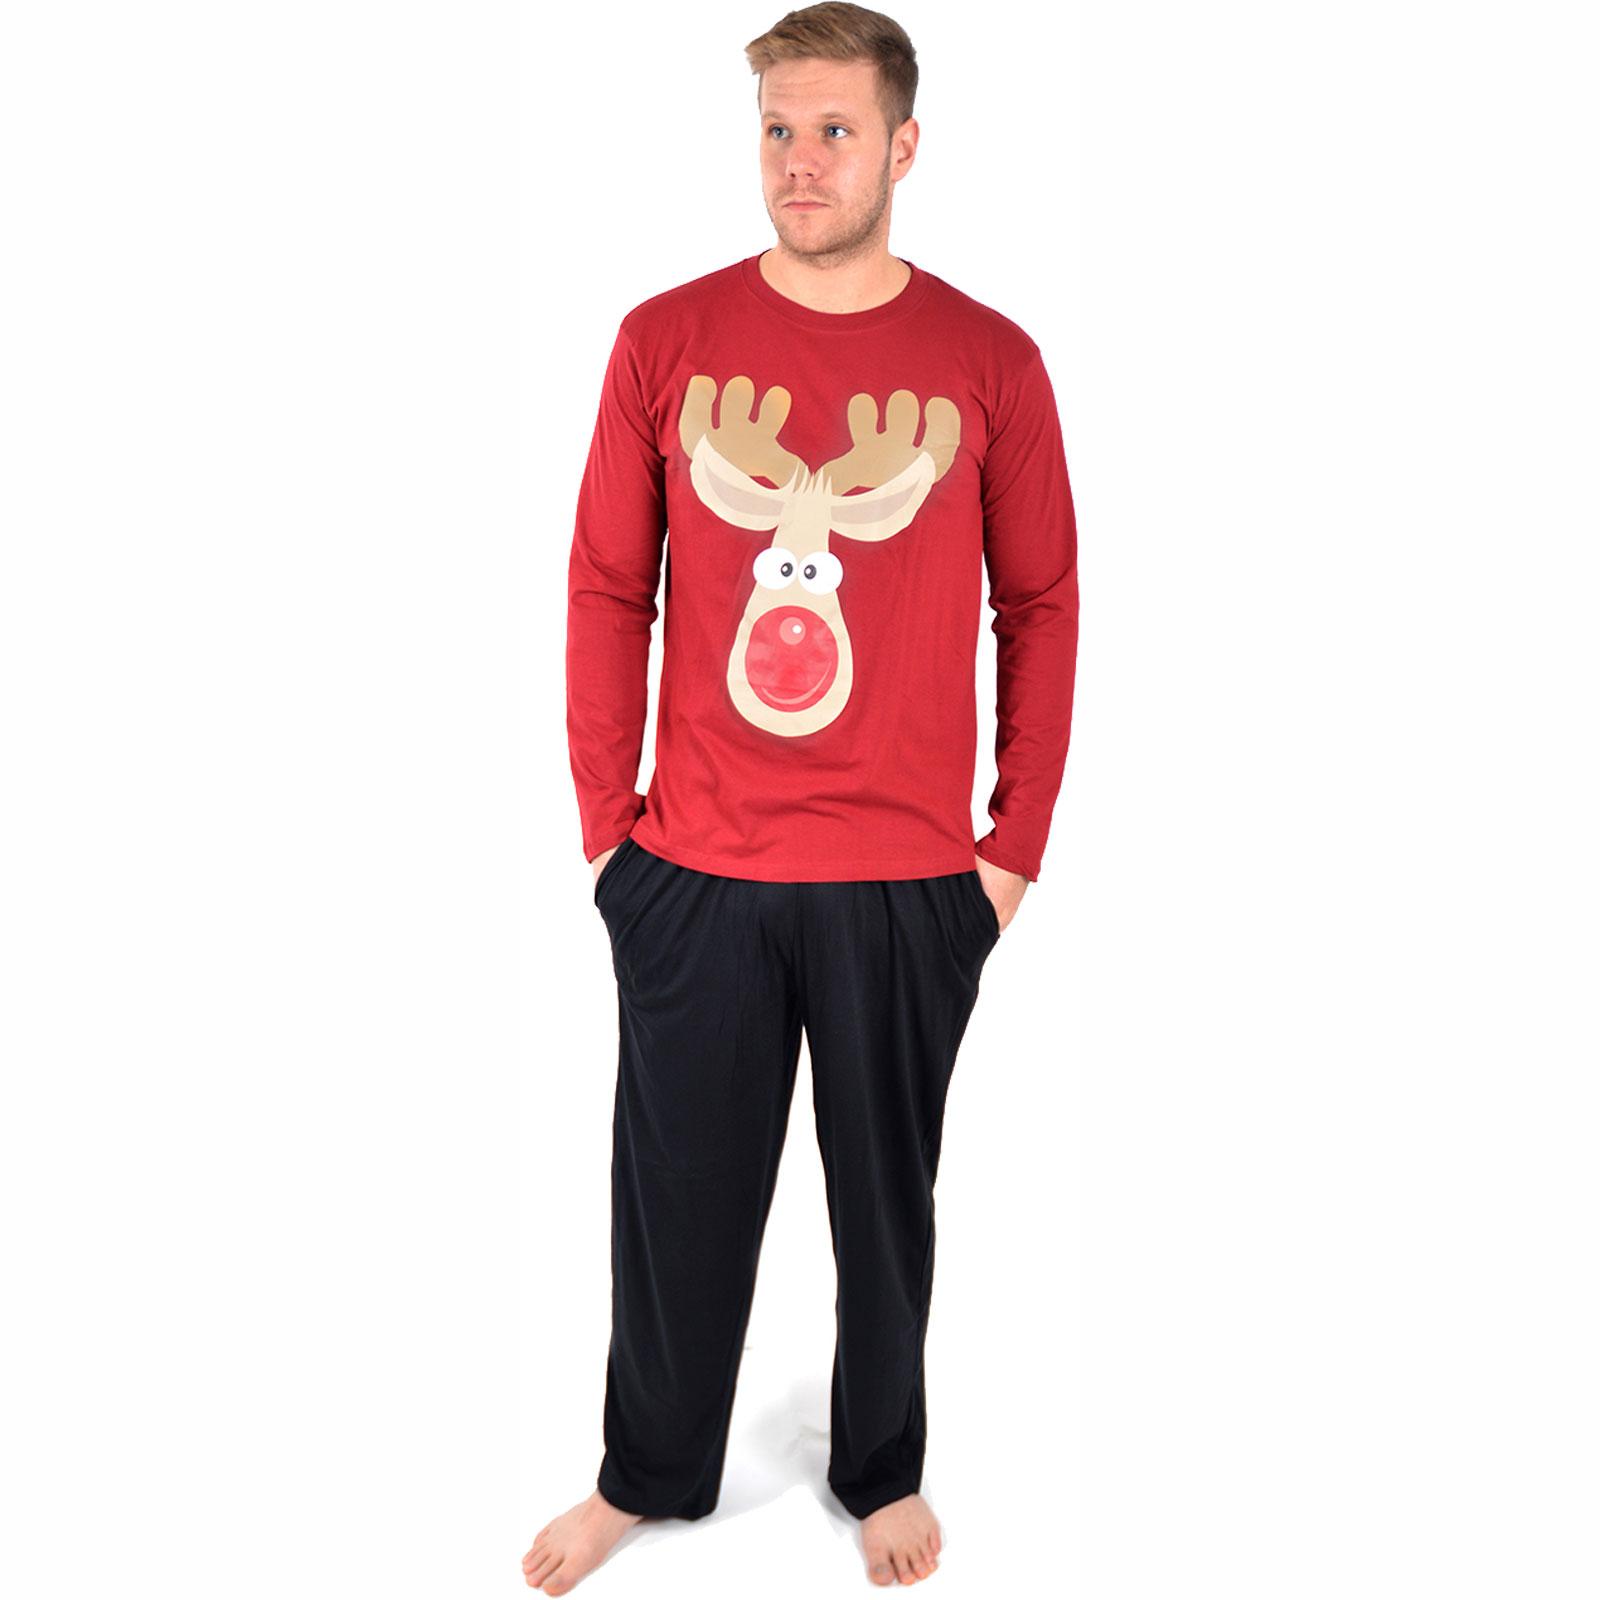 Mens Novelty Christmas Xmas Pyjama Set Present PJ Night Sleep Wear ...